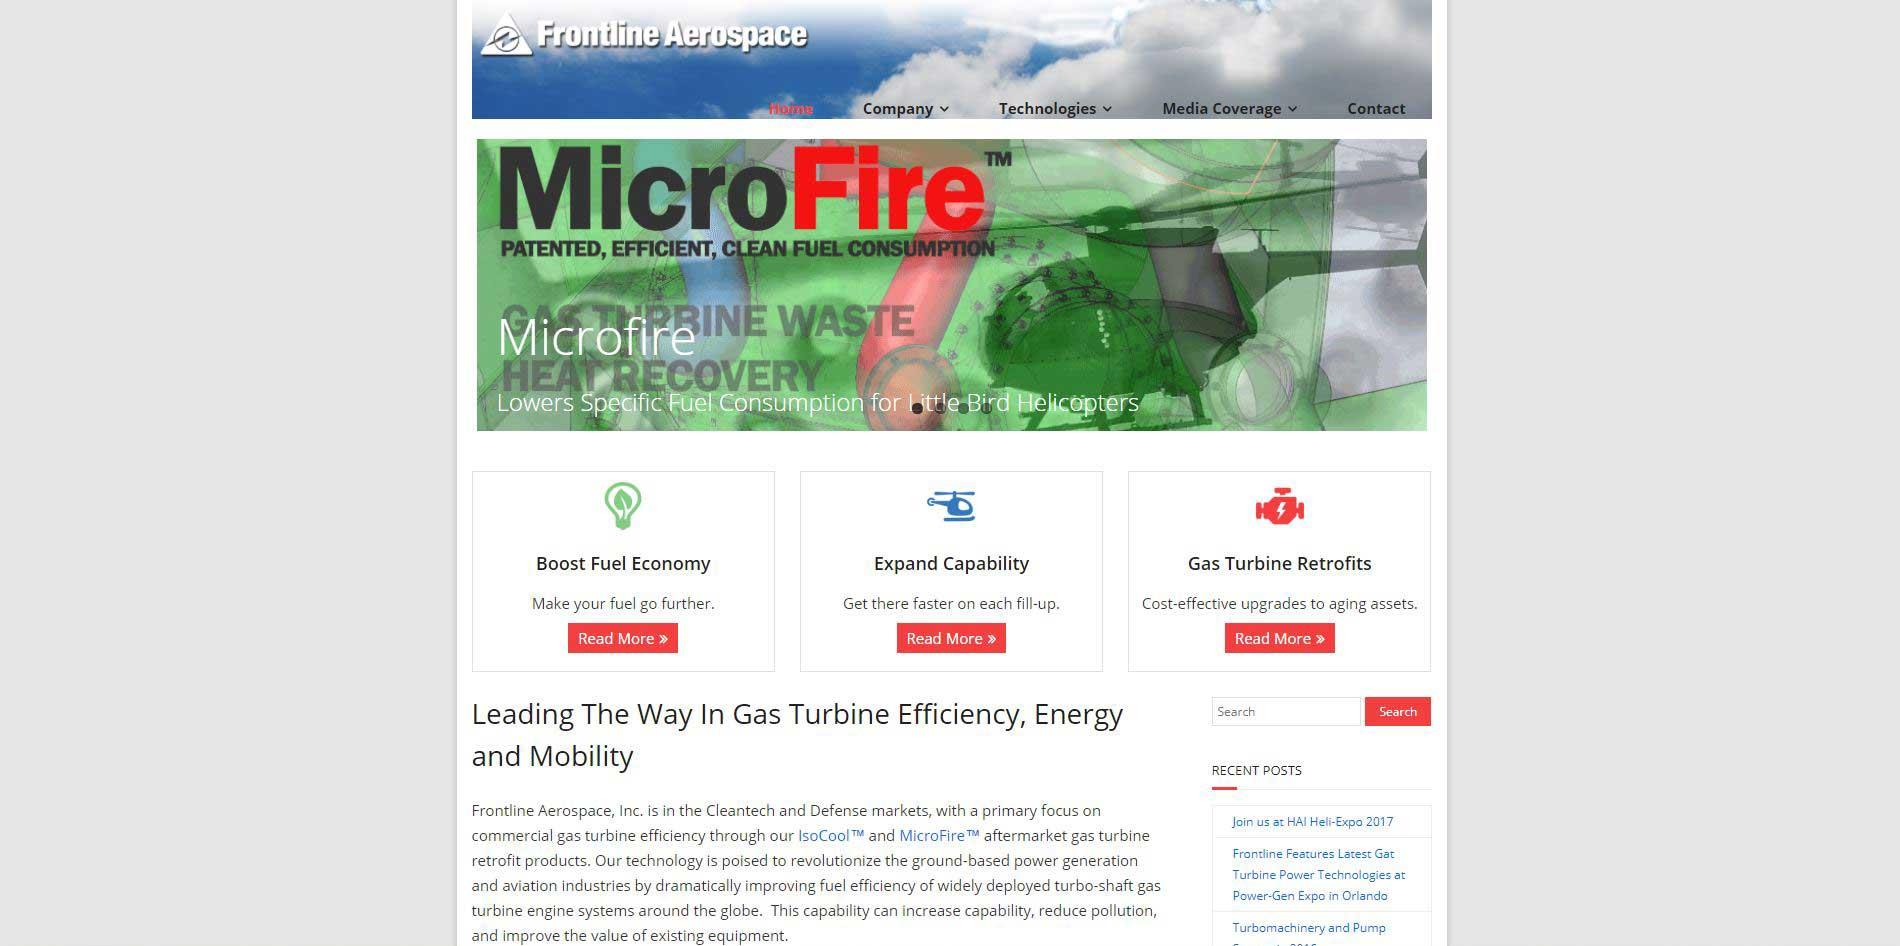 gas turbine efficiency upgrades